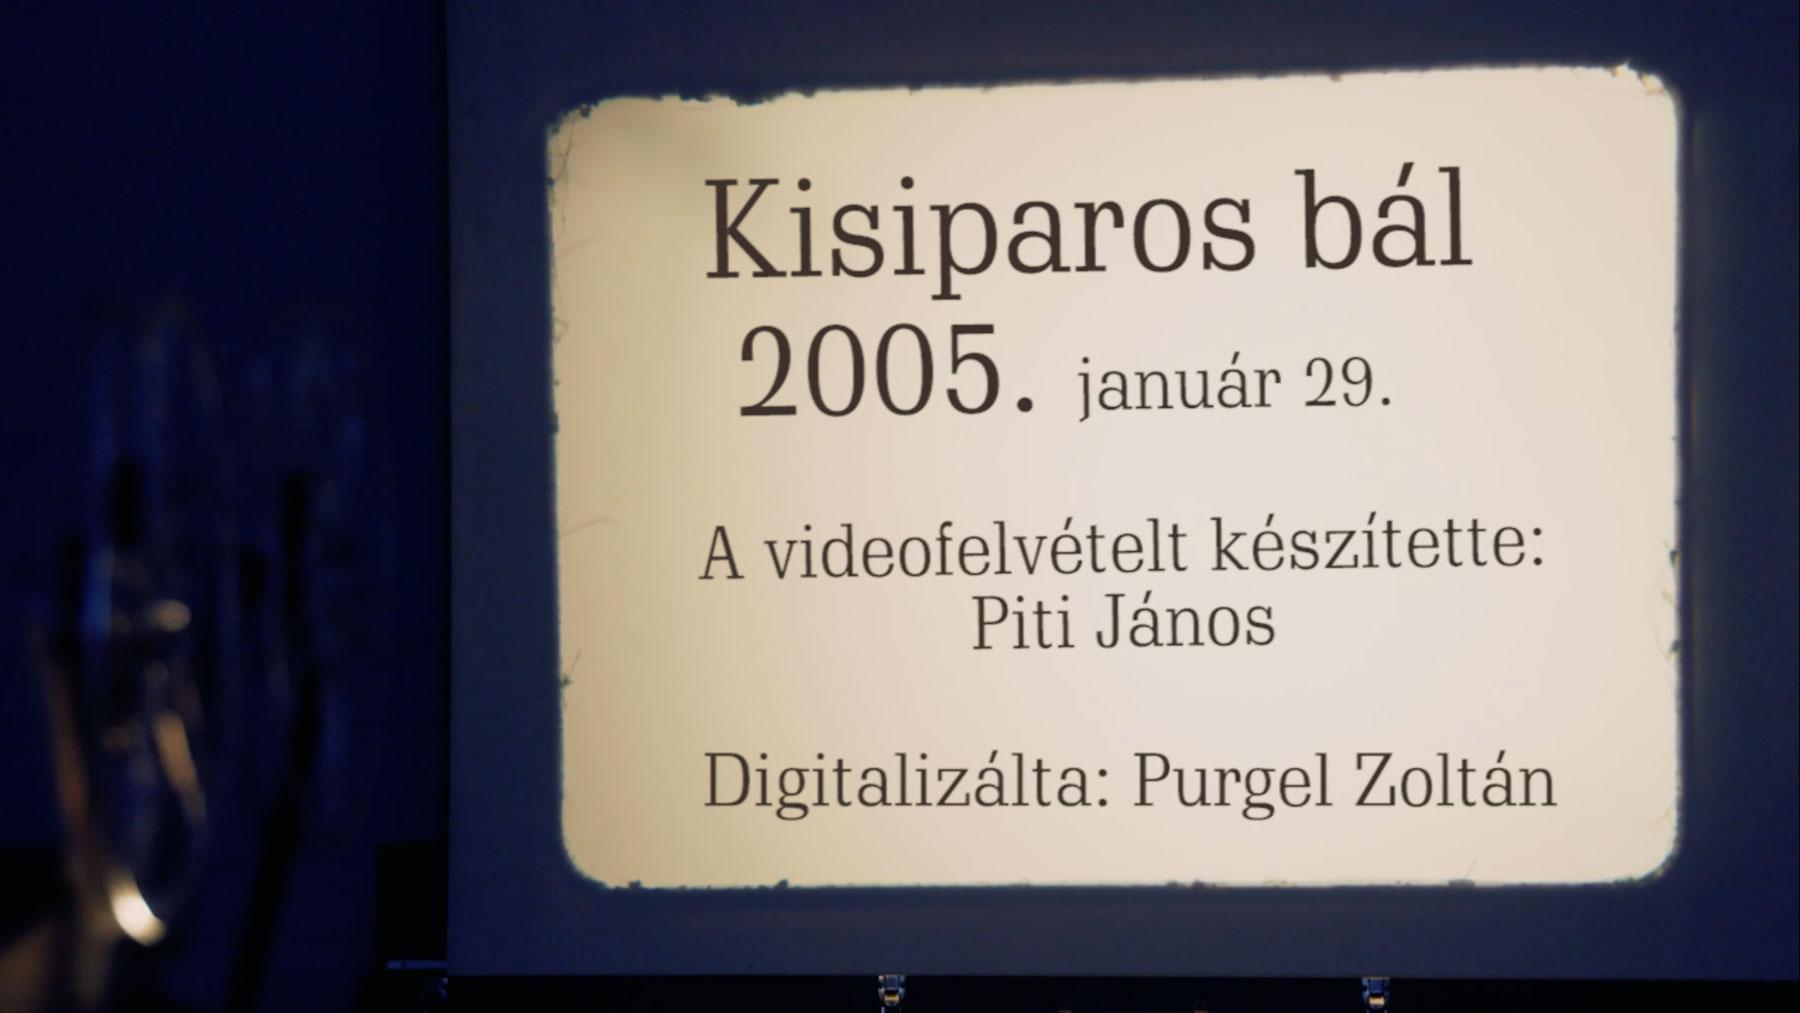 Kisiparos bál – 2005.